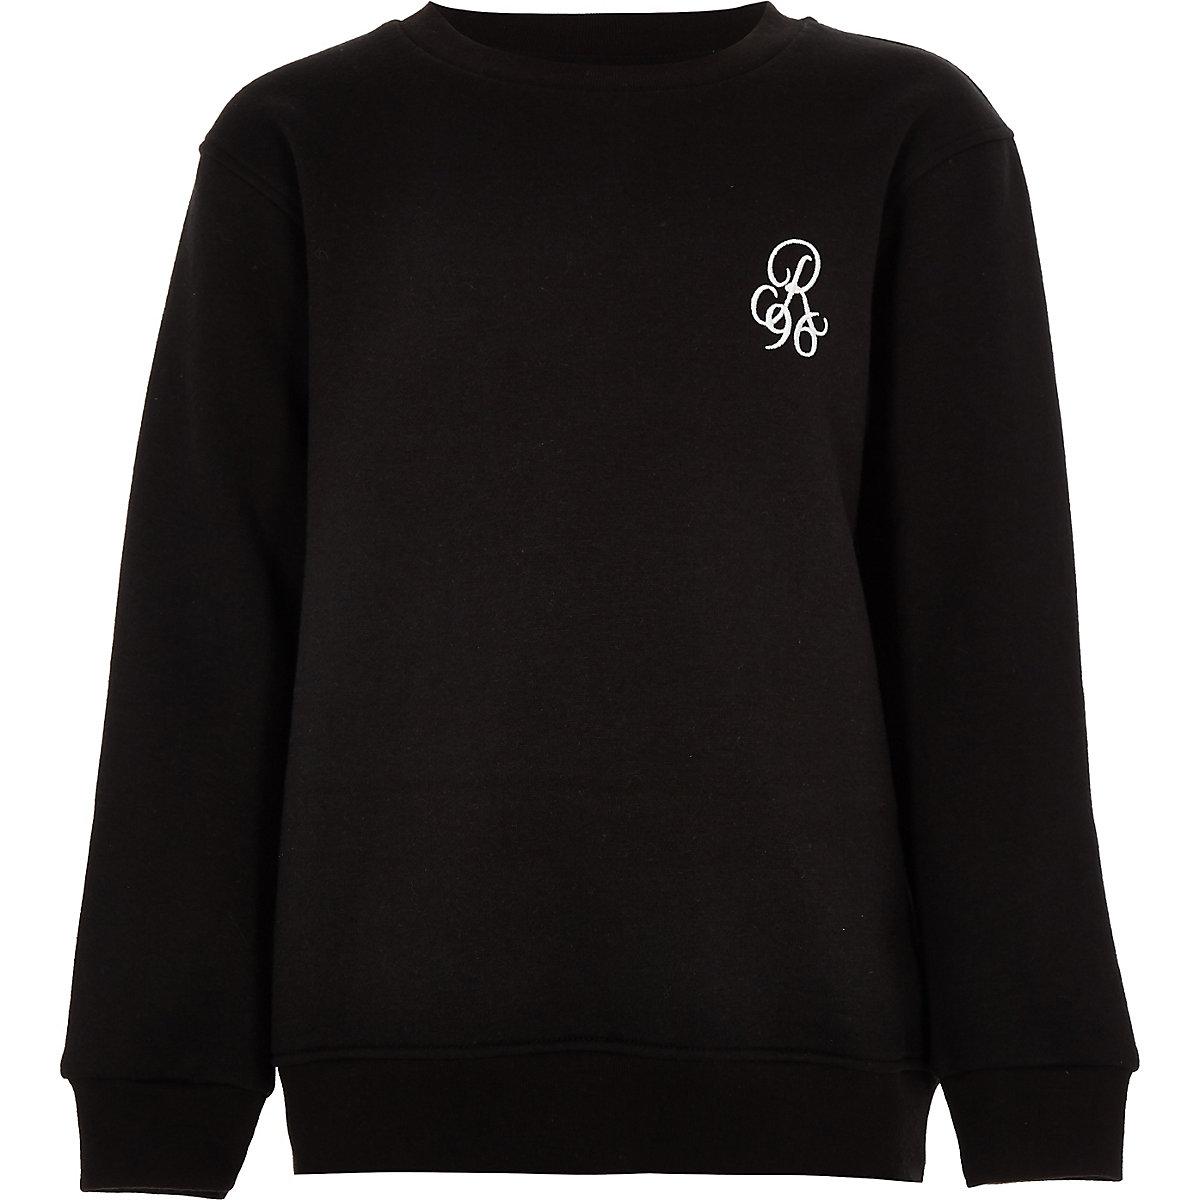 Boys black 'R96' sweatshirt